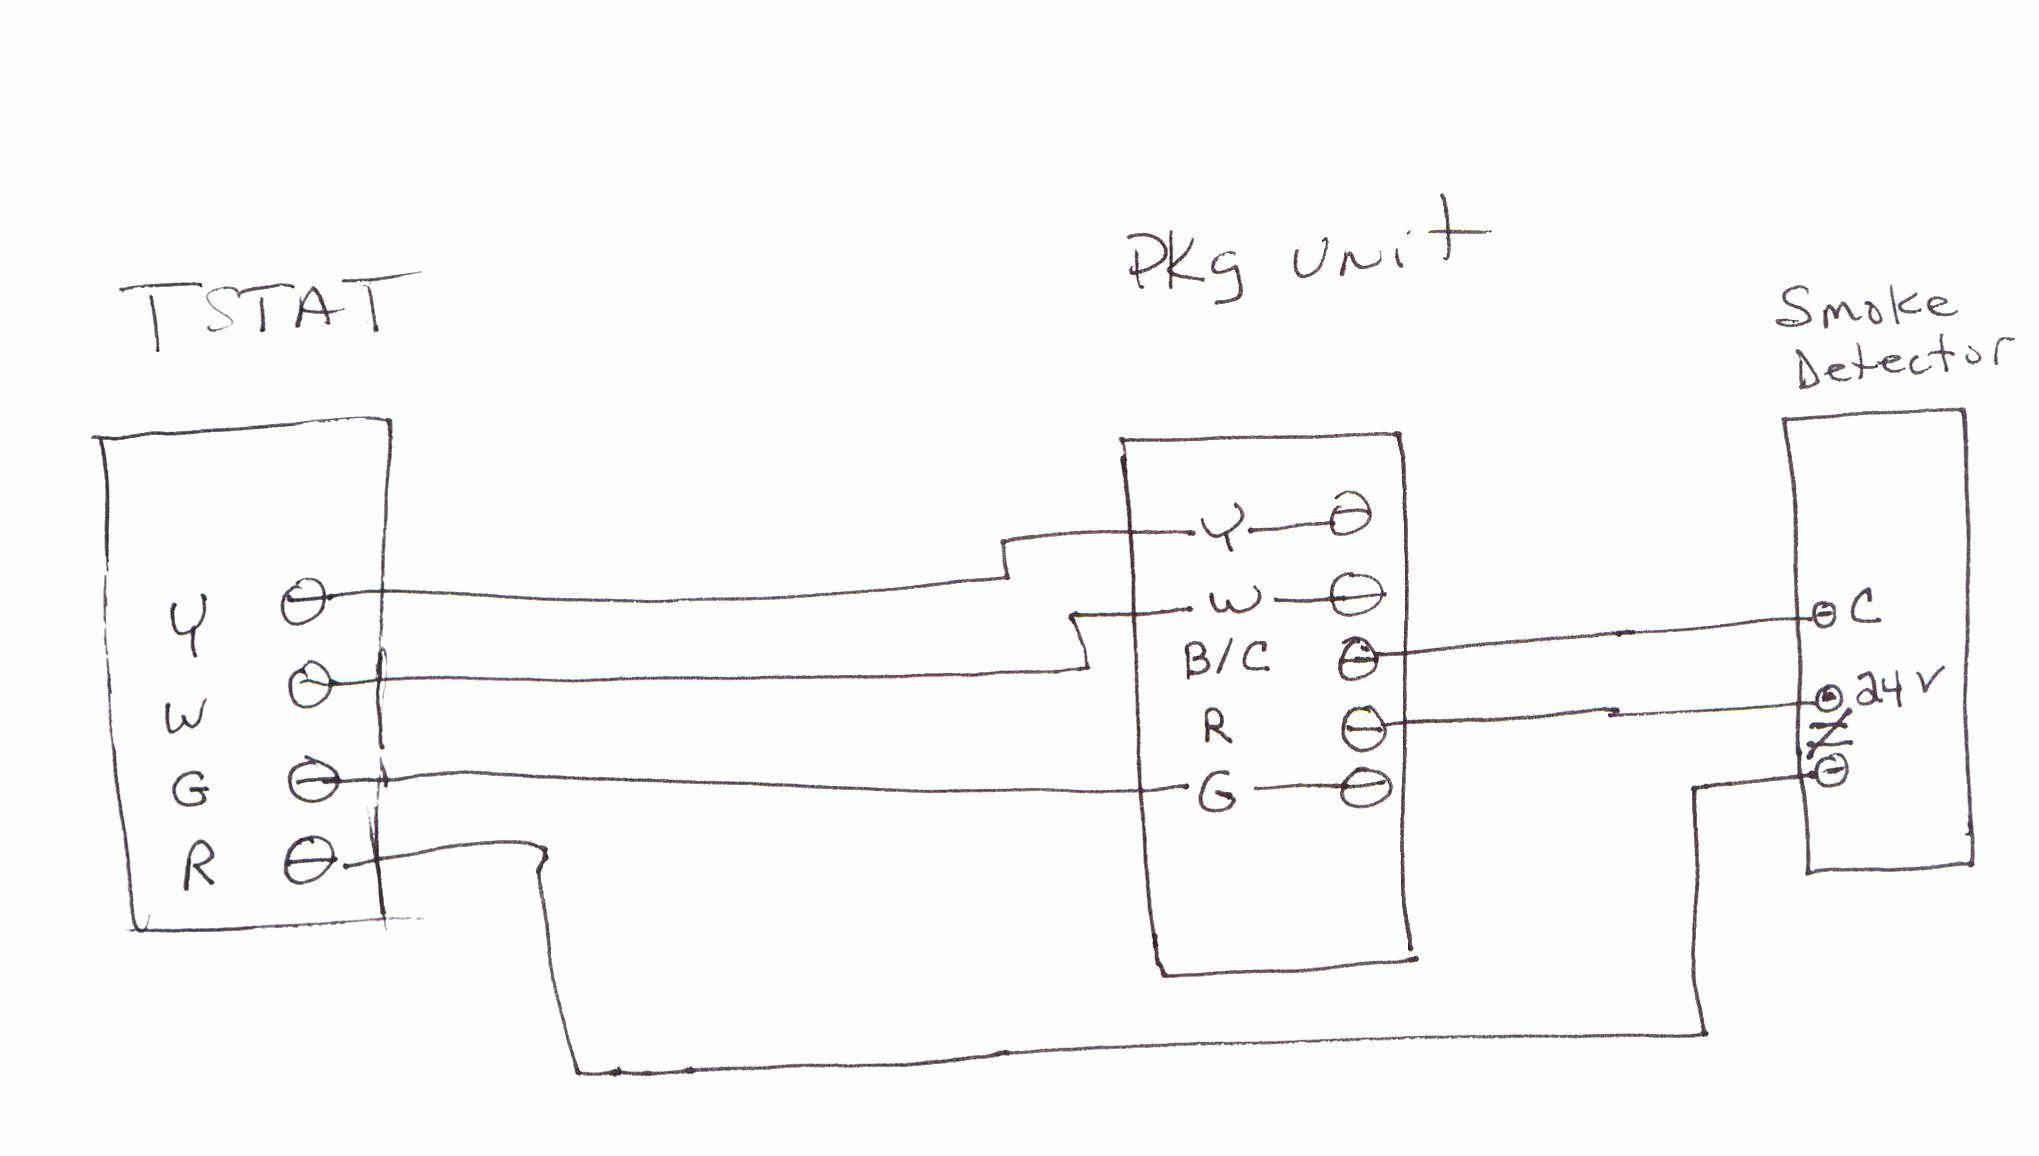 Duct Smoke Detector Wiring Diagram | Manual E-Books - Duct Smoke Detector Wiring Diagram